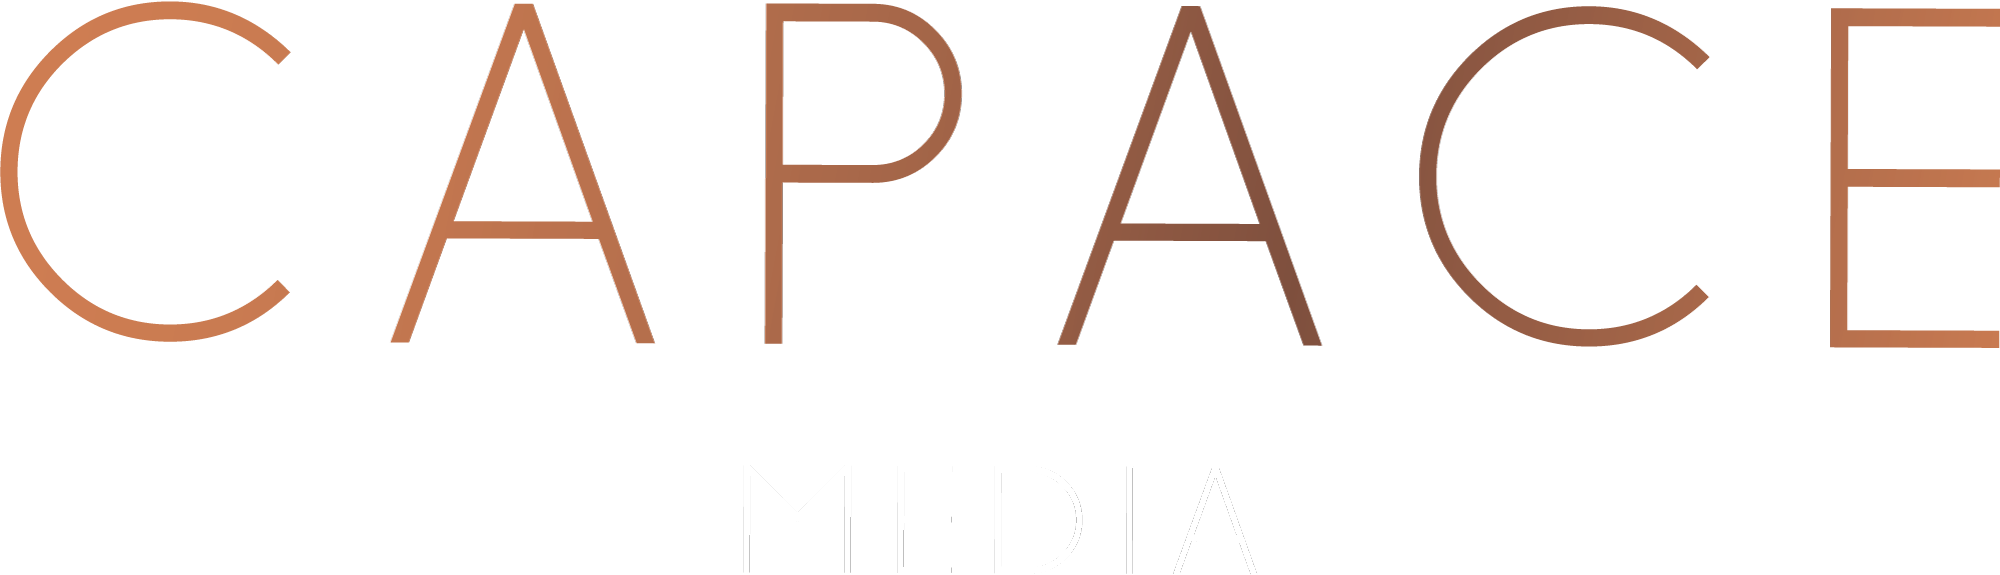 Capace Media